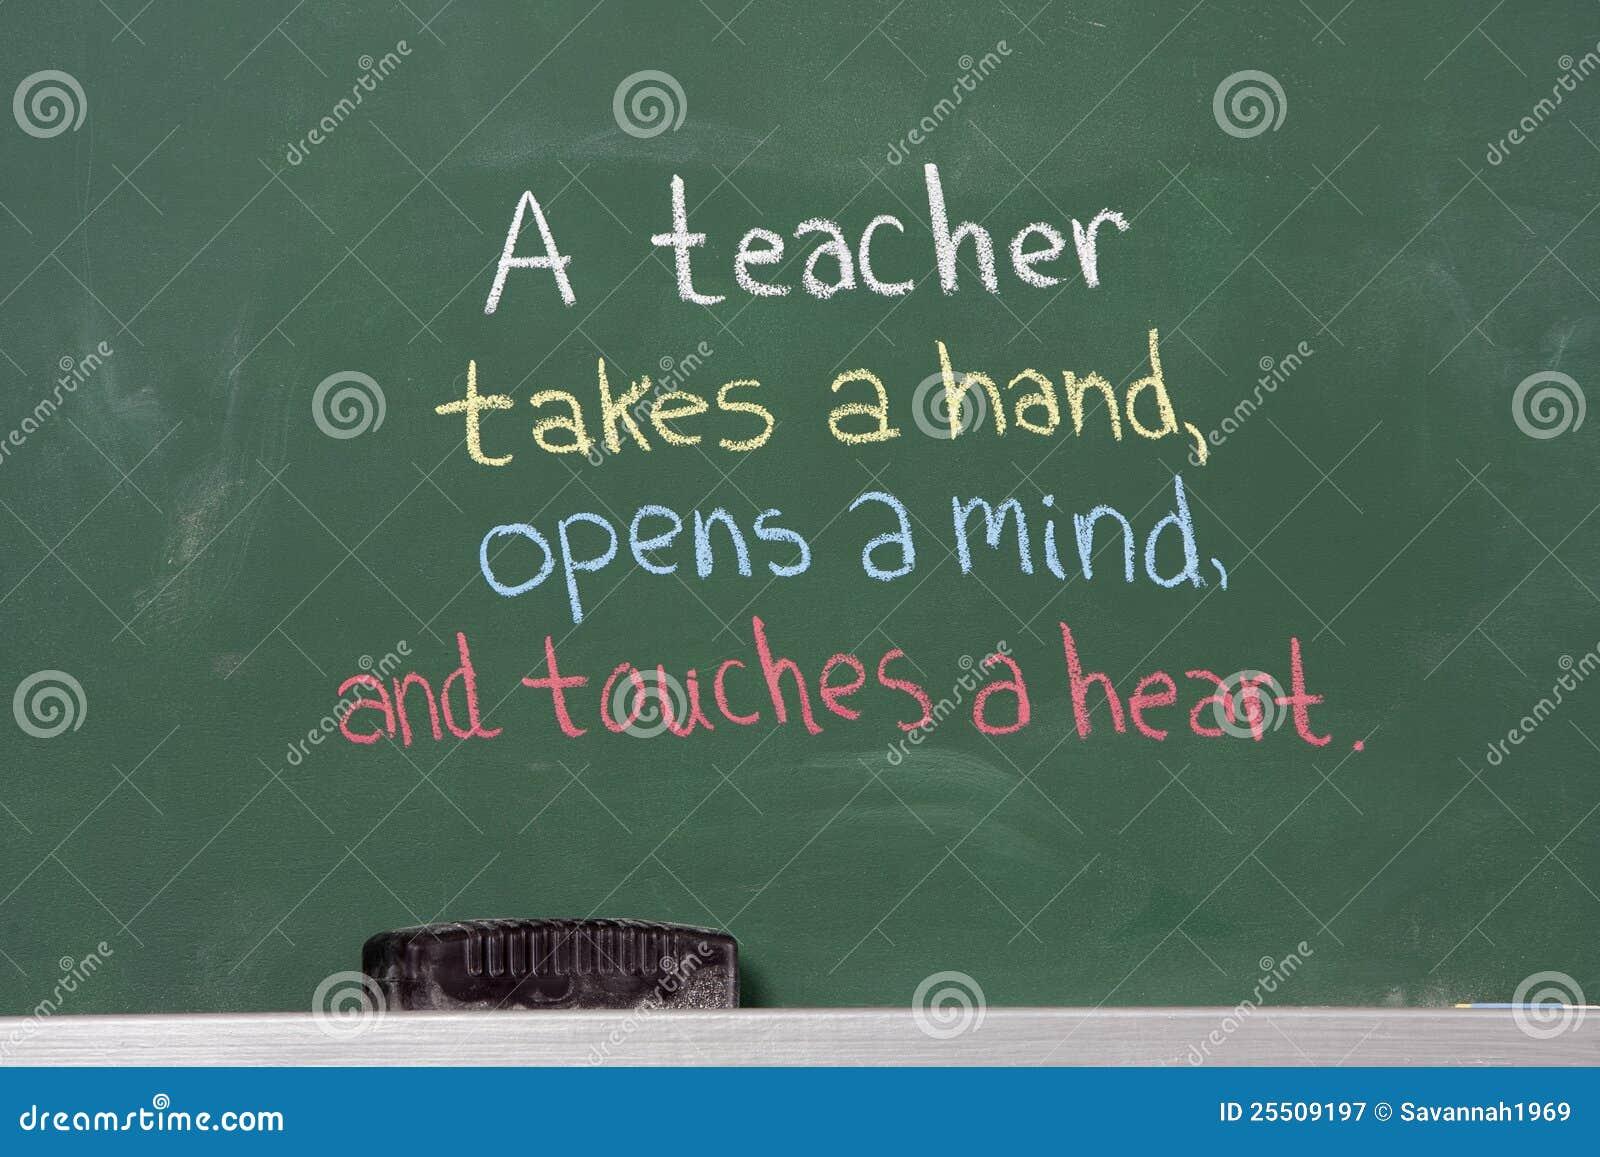 inspirational phrase for teacher appreciation royalty free